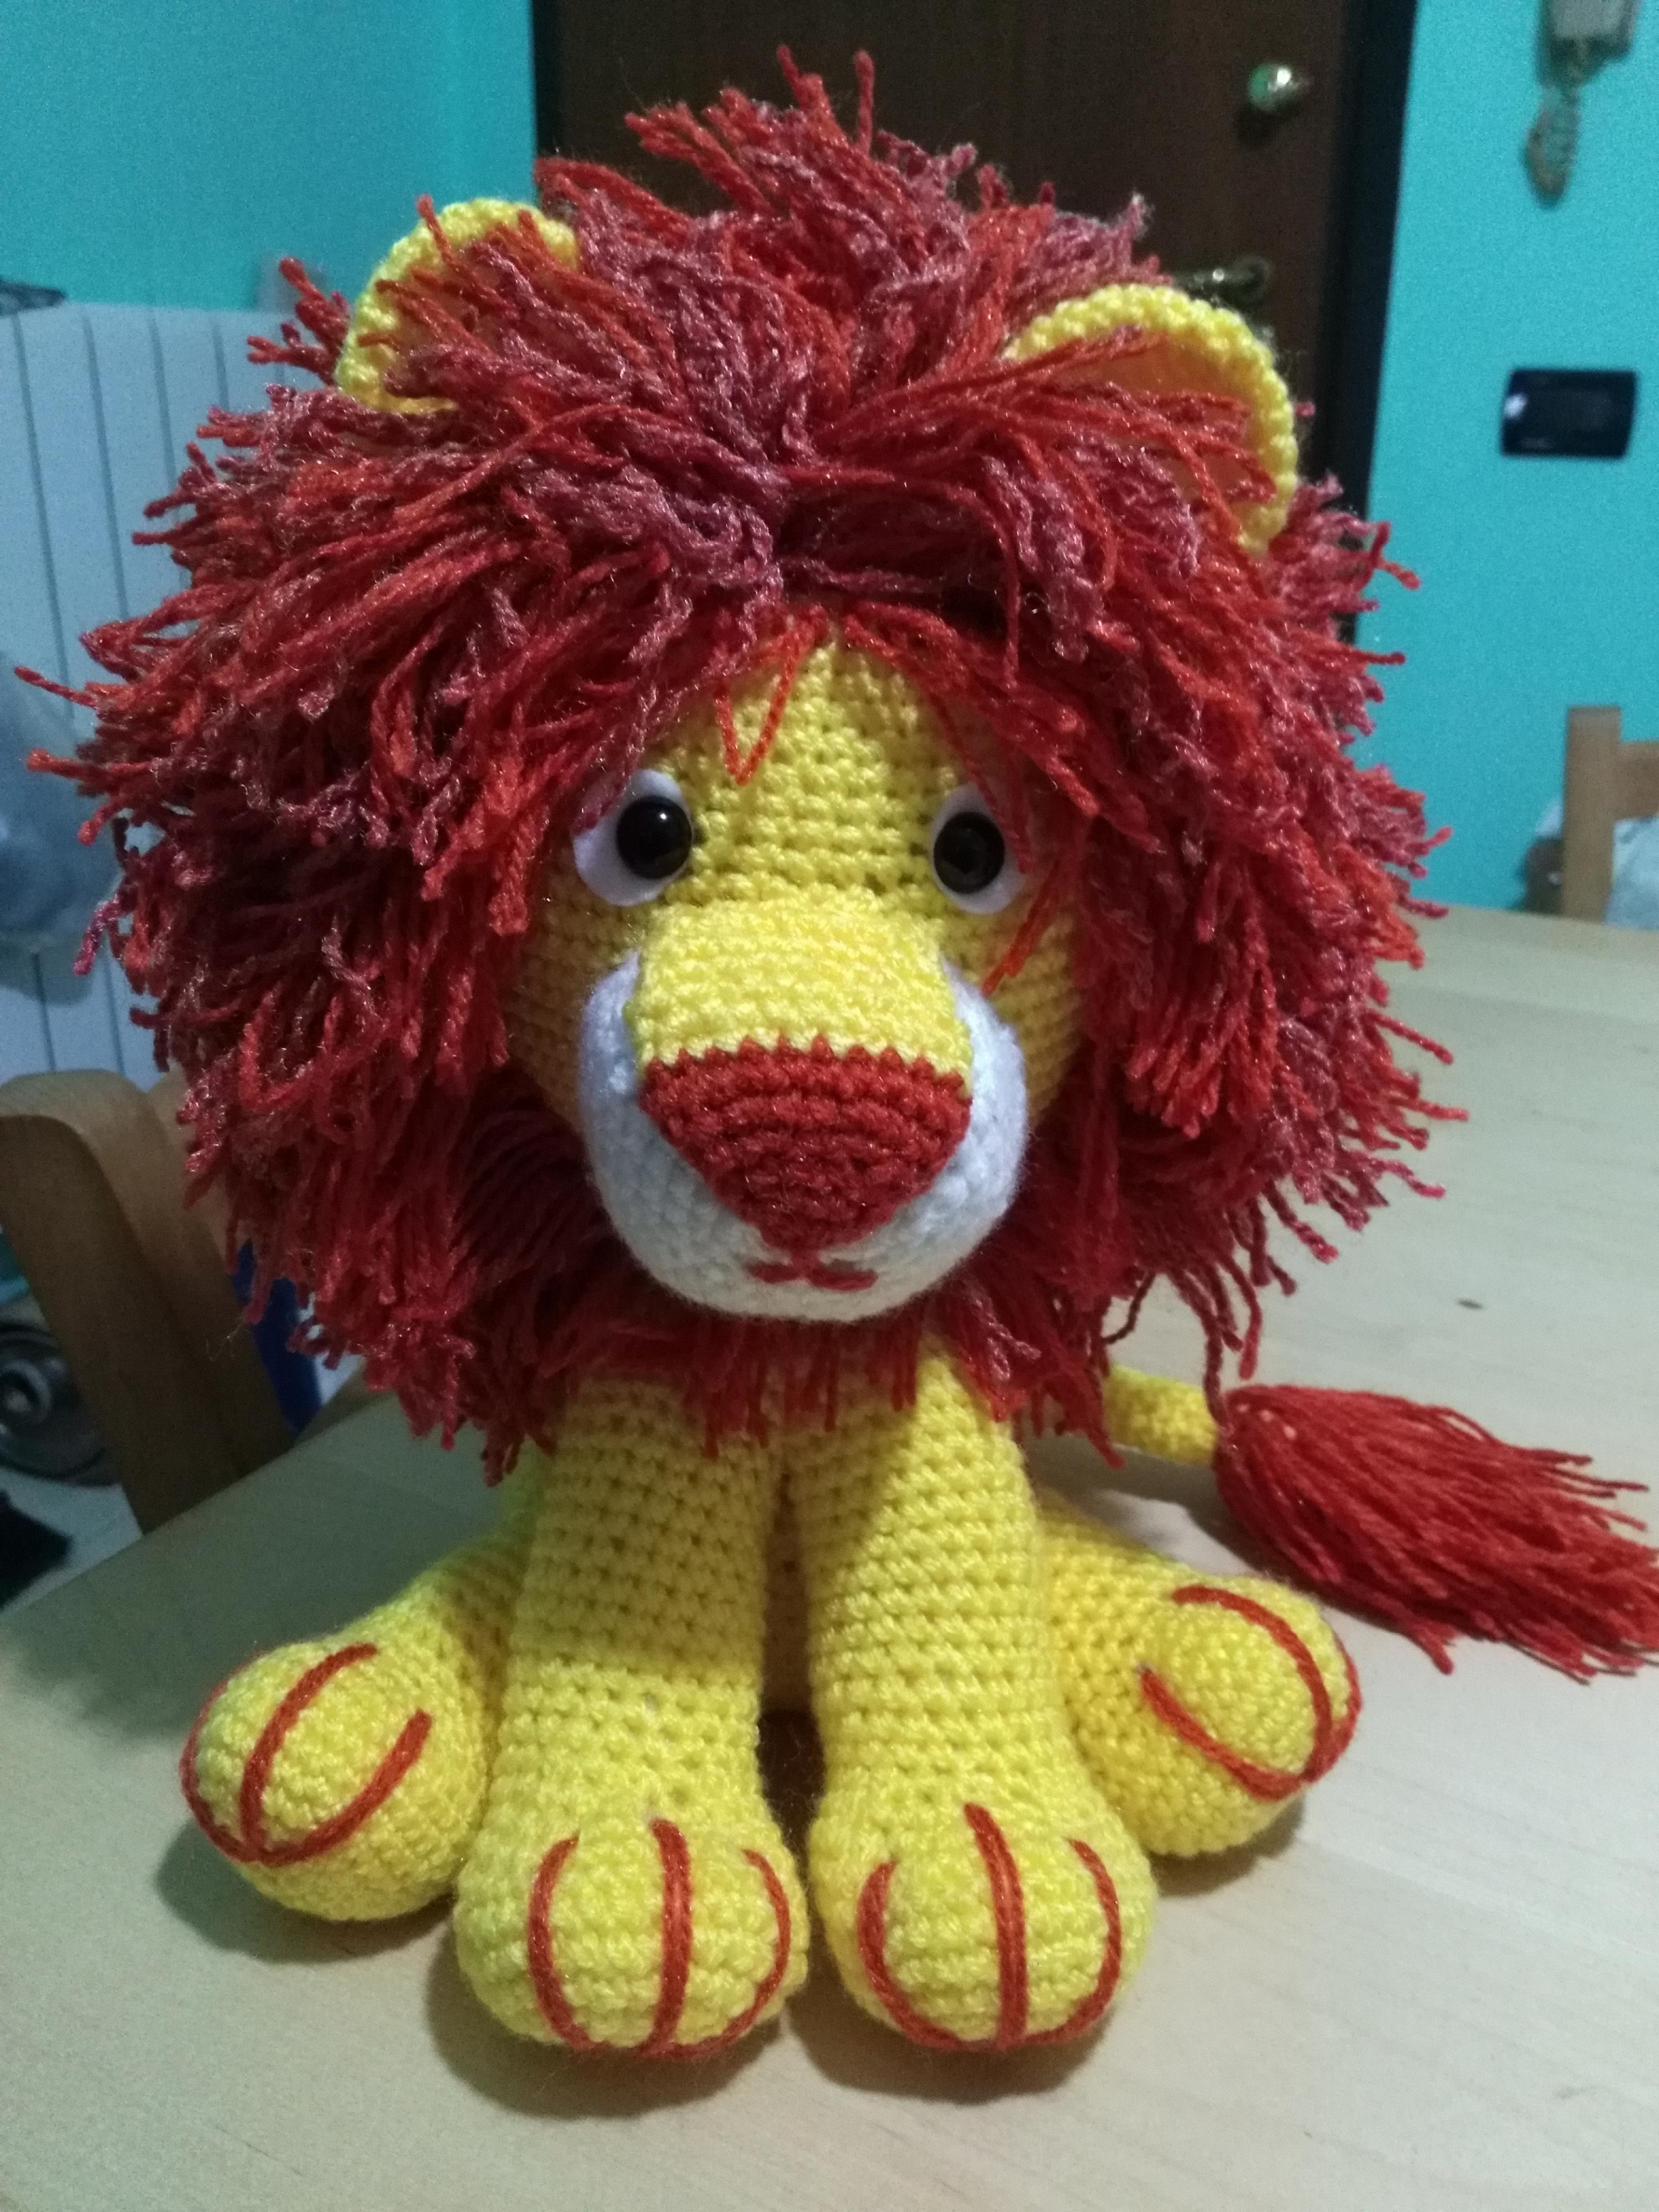 Lion Amigurumi Pattern - Free Crochet Pattern • Craft Passion | 4000x3000